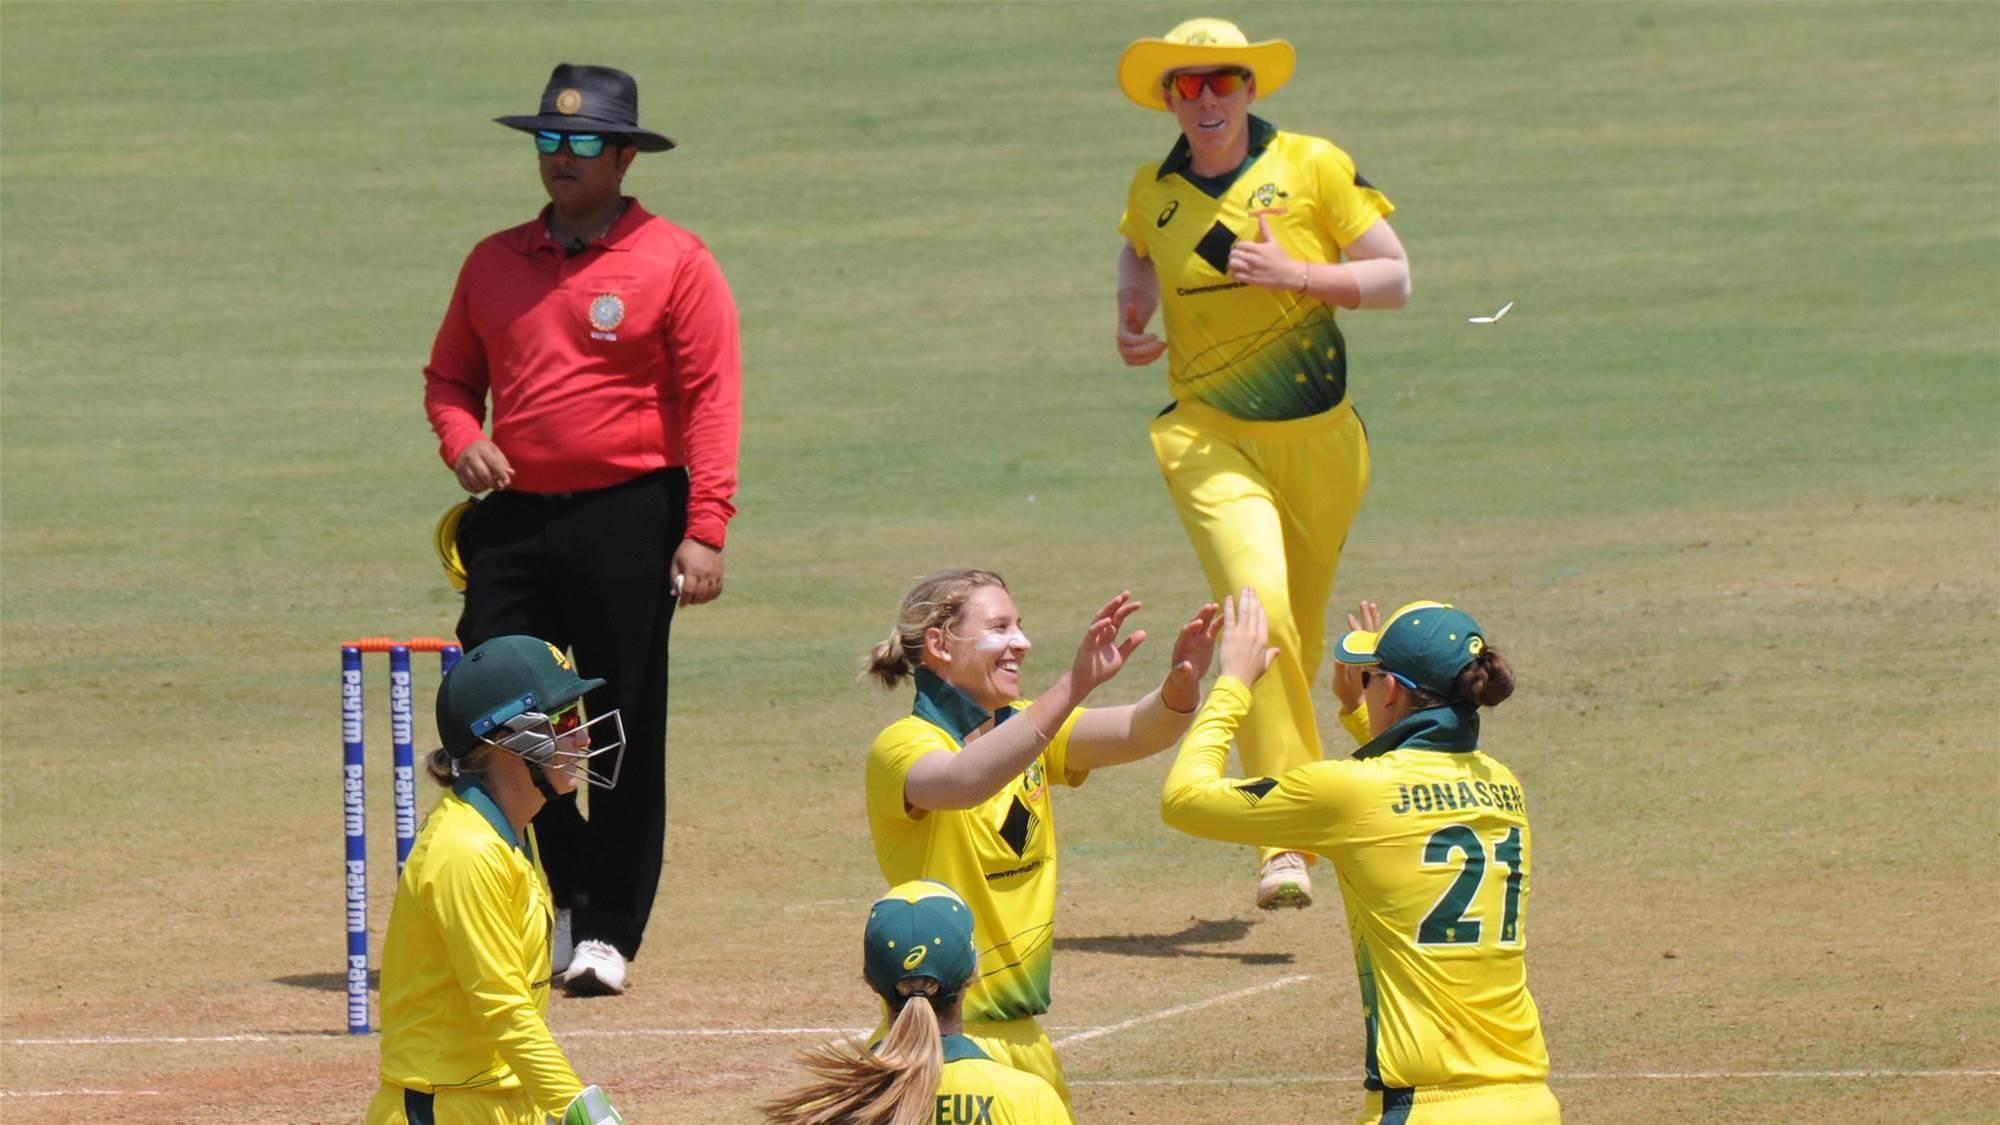 Australia's brilliant bowling effort crushes England